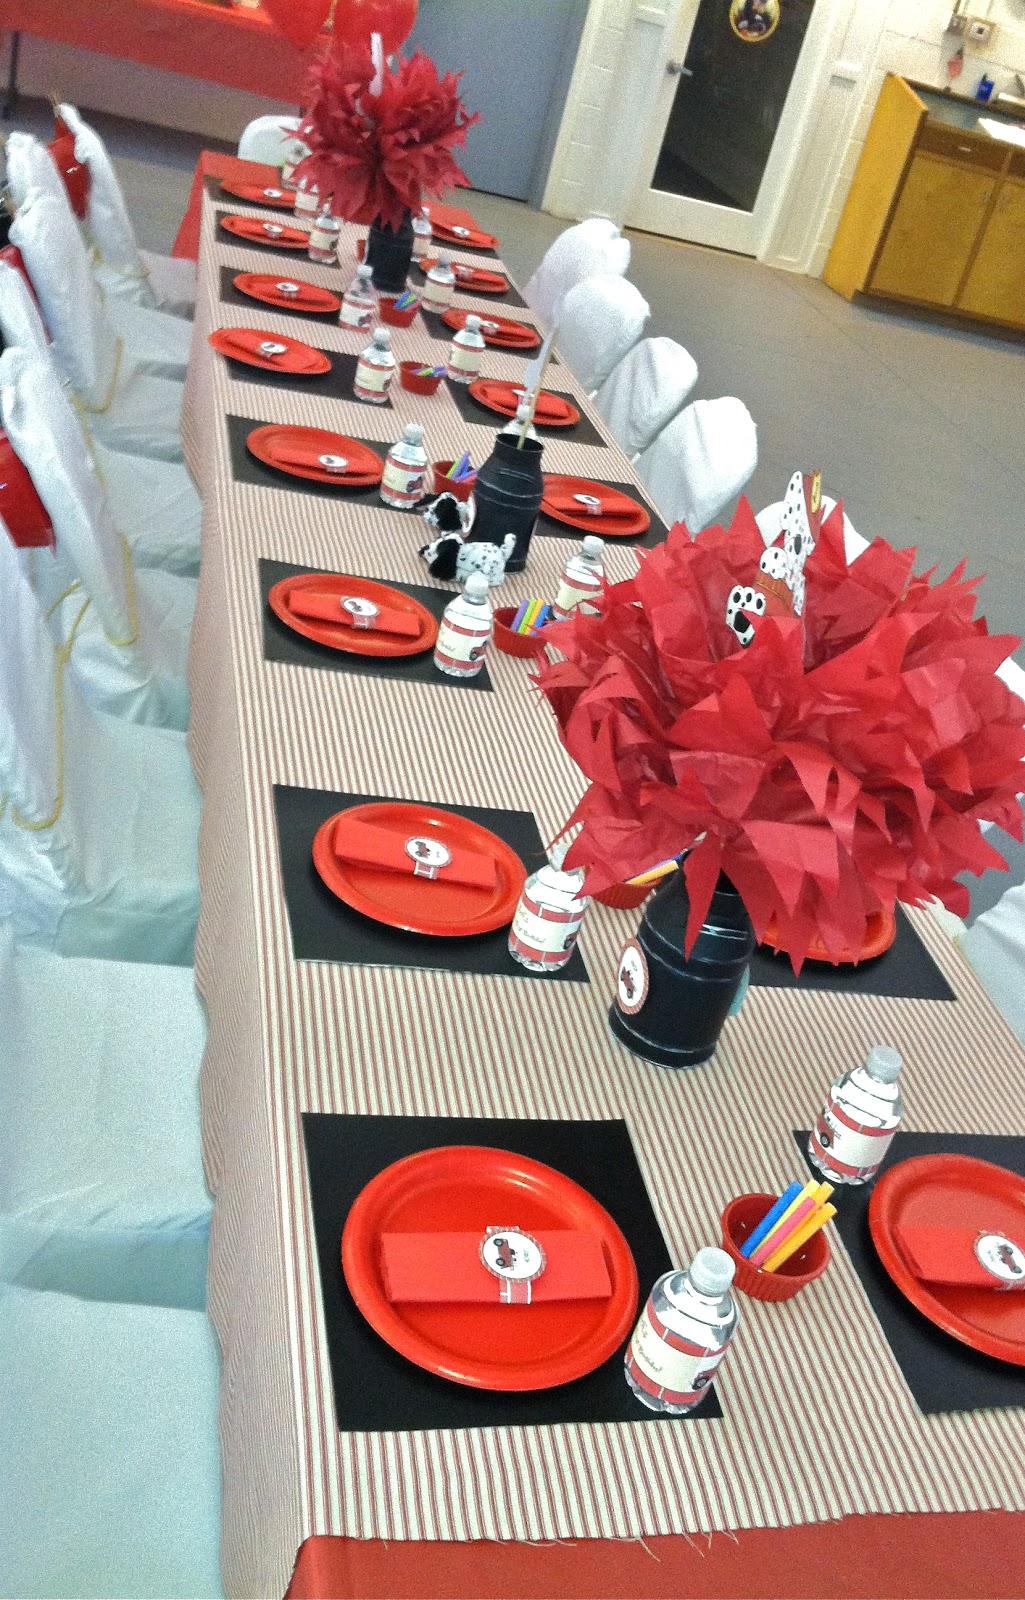 Pretti Mini Blog Jacks Blazin Fire Fighter Party